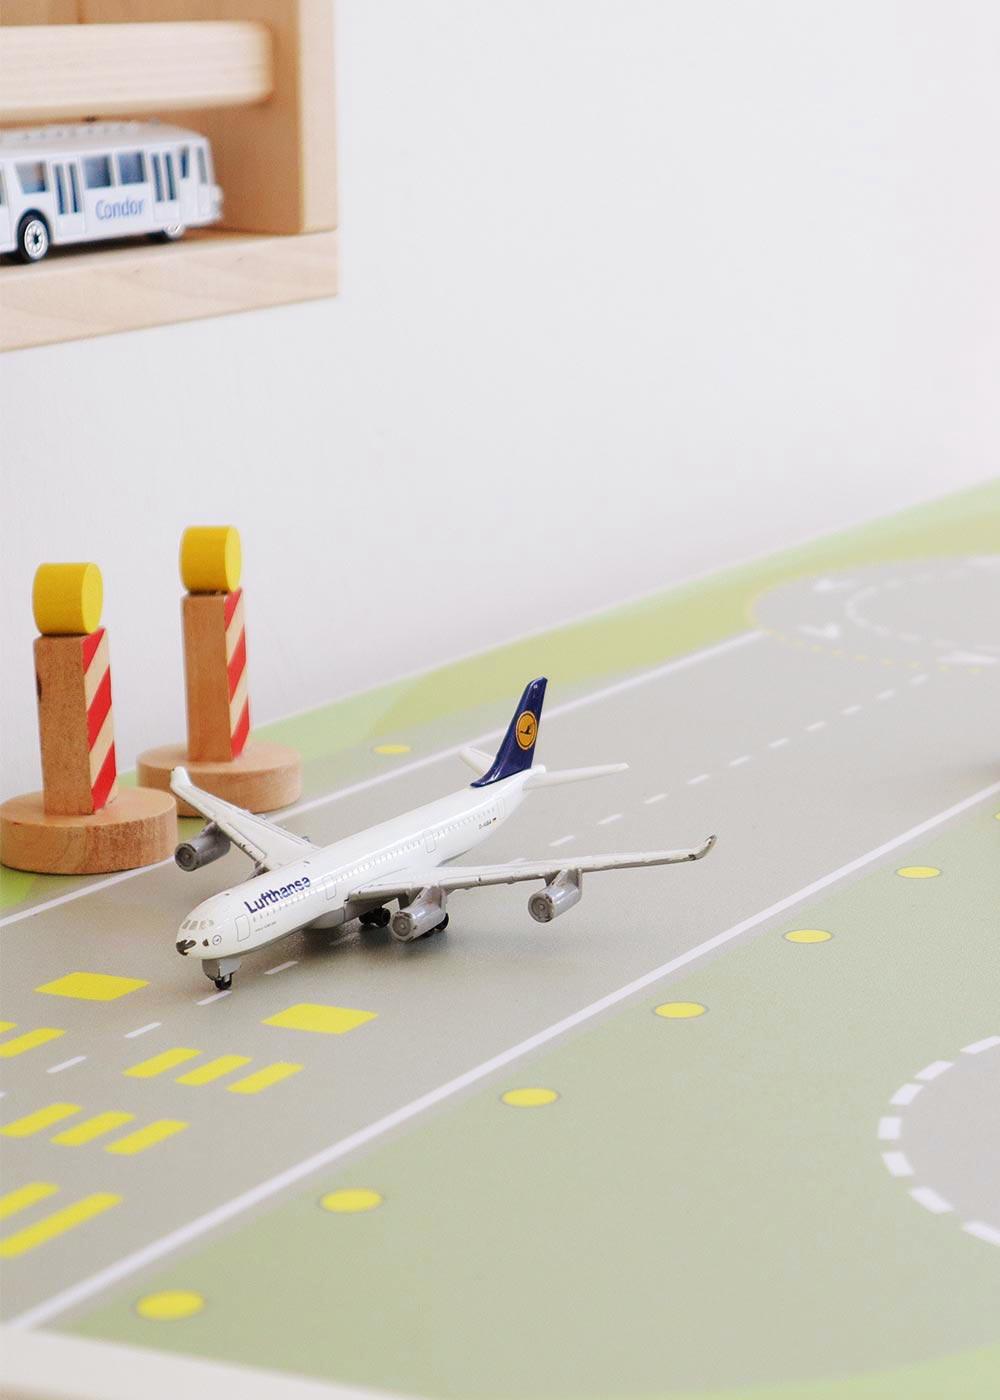 Ikea Smastad Bank Landebahn Teilansicht